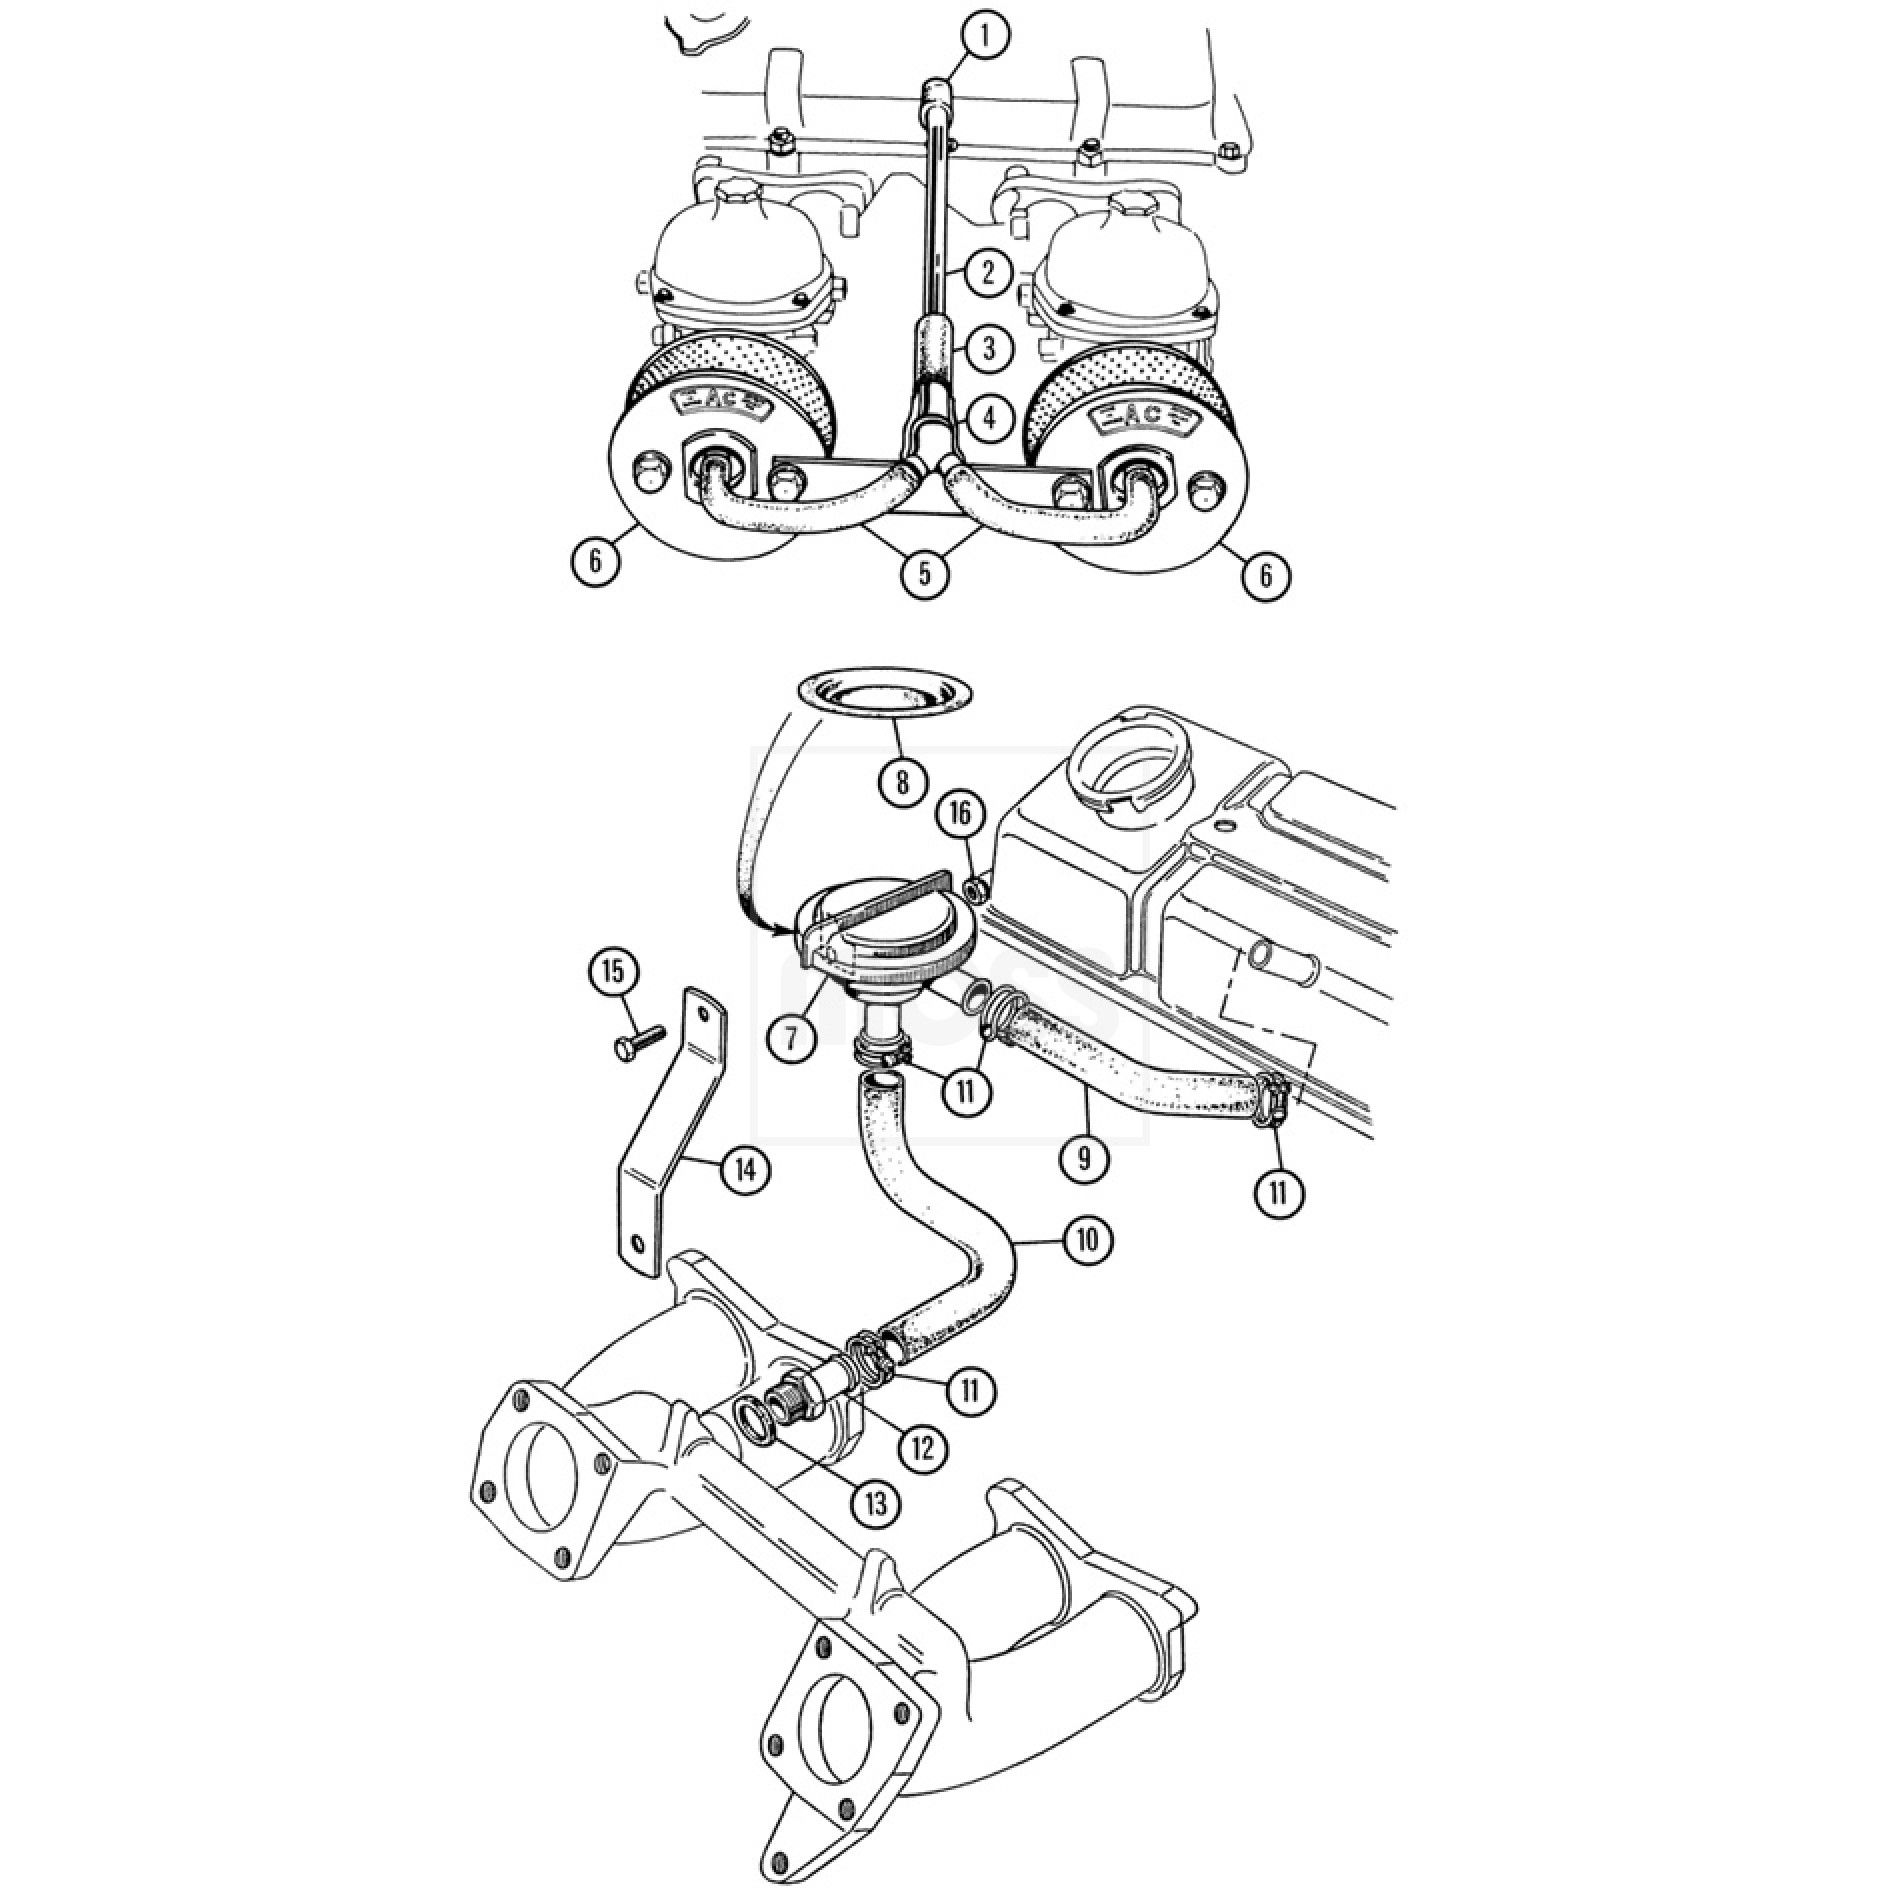 engine breather  u0026 emission controls